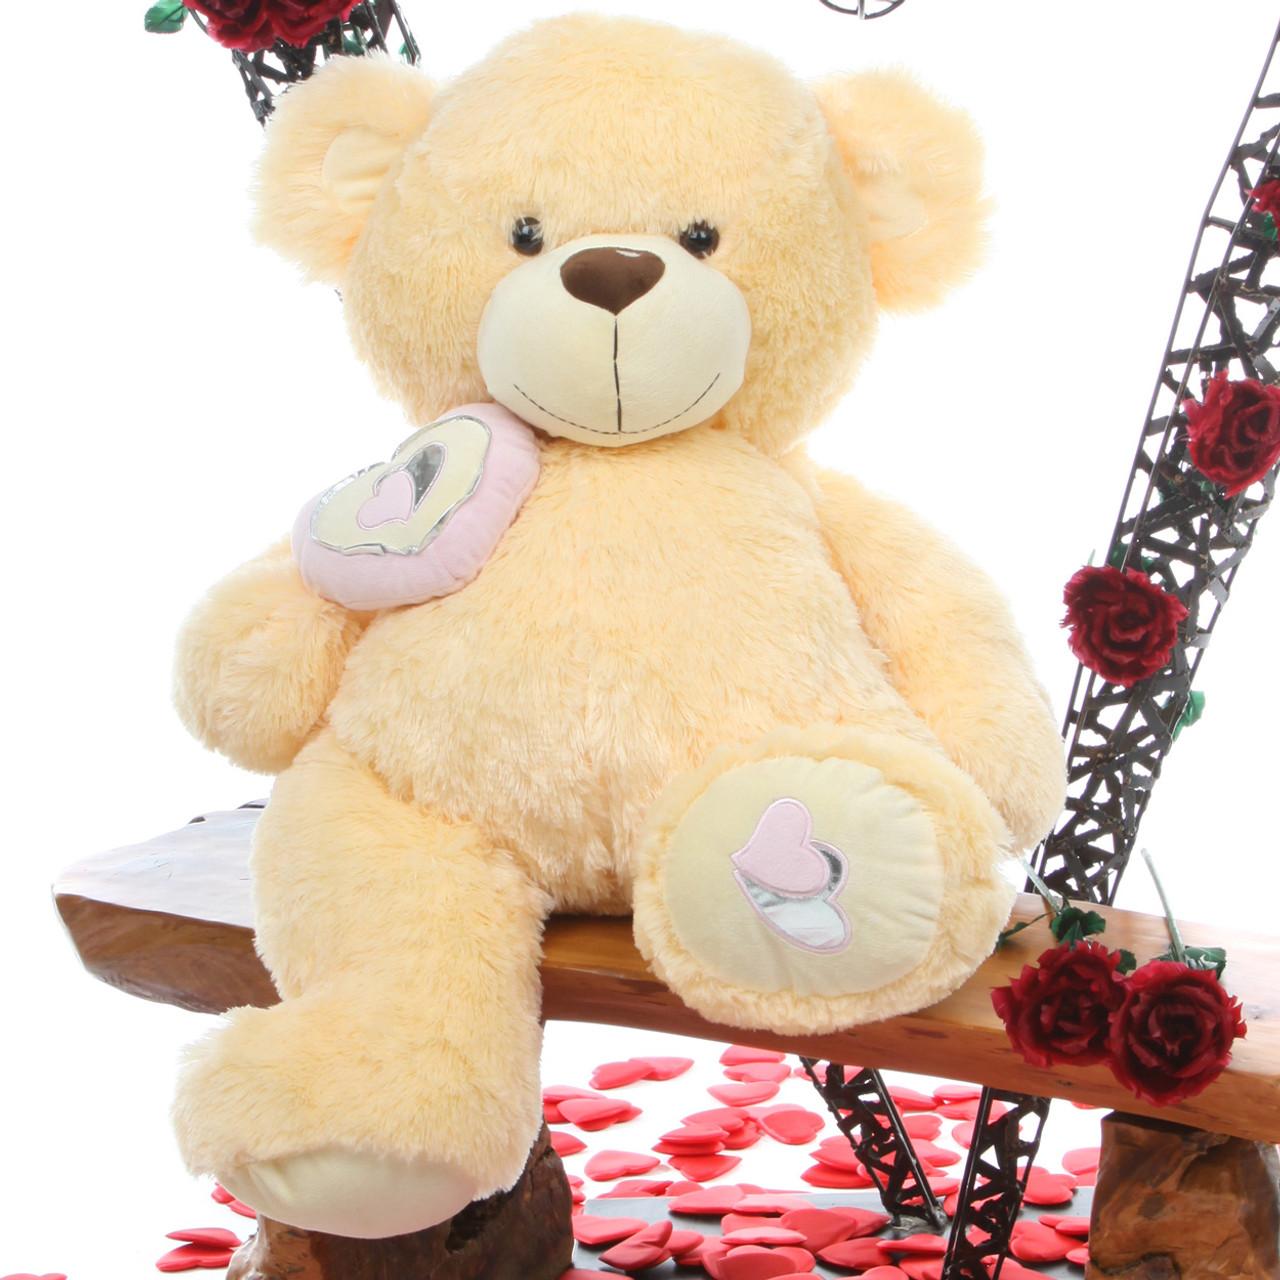 Honey Pie Big Love butterscotch cream teddy bear 30in